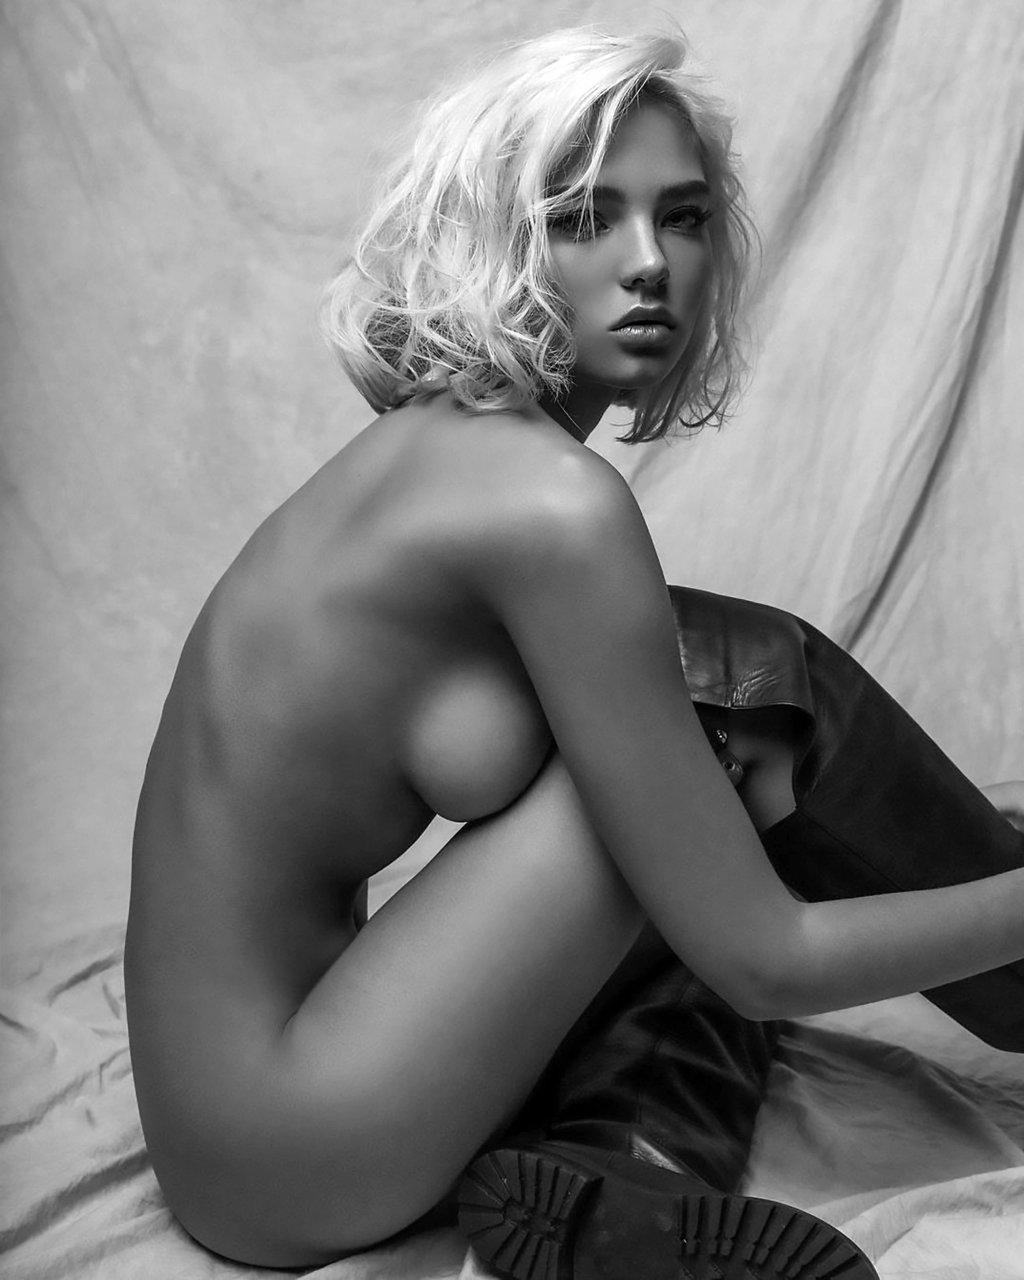 Russian model tv presenter alesya kafelnikova nude leaked fappening